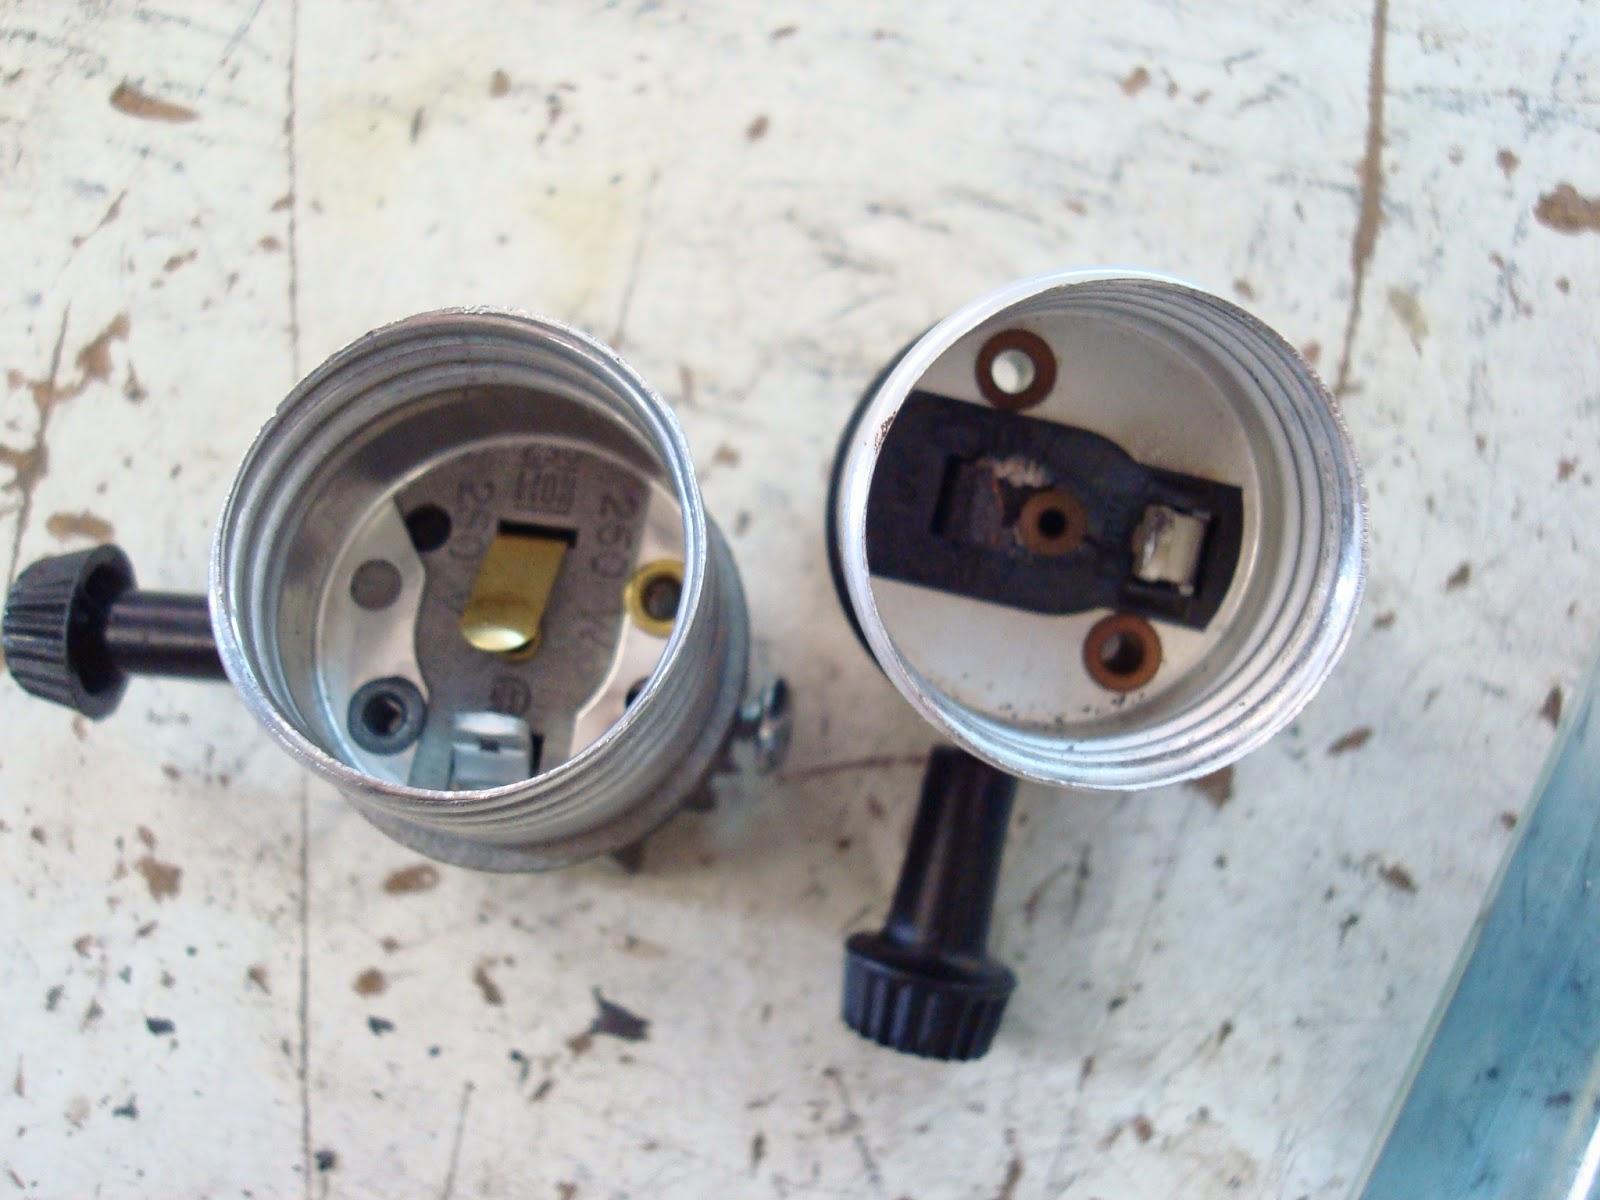 Lamp Parts and Repair  Lamp Doctor: Large Bronze Table Lamp Flickers